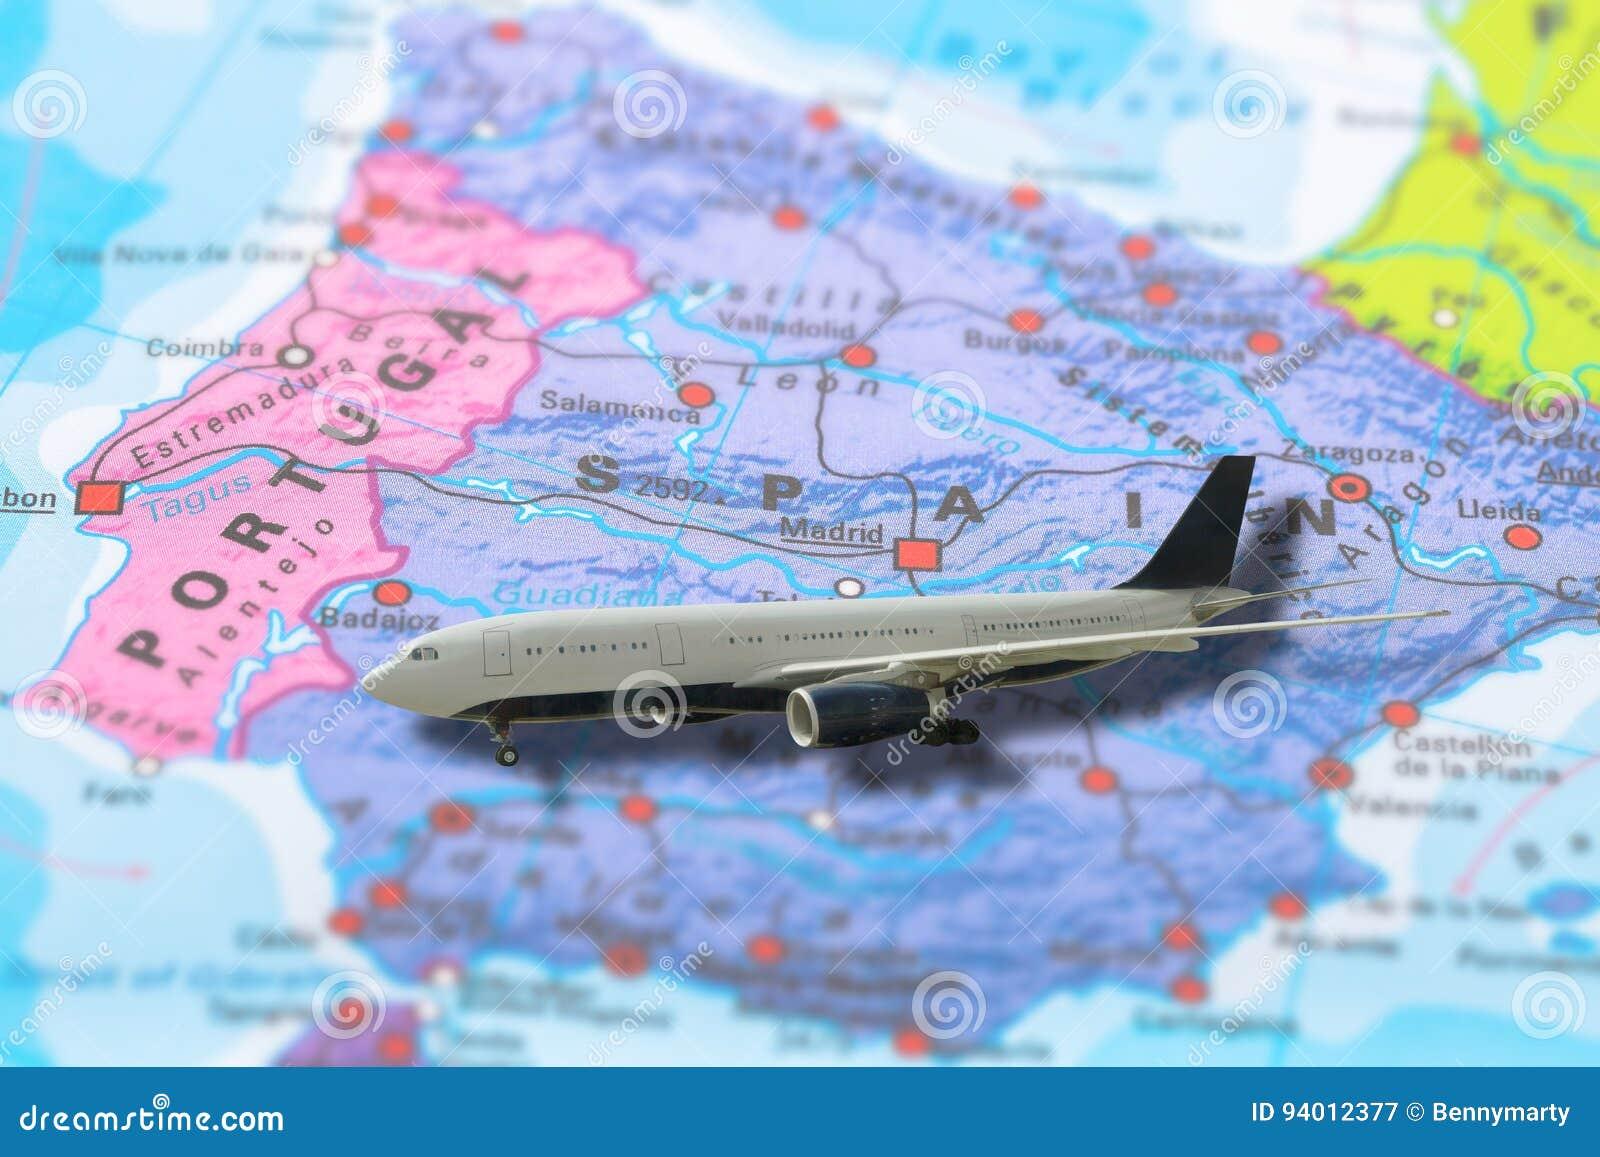 Madrid Spain flight stock image. Image of europe, aviation - 94012377